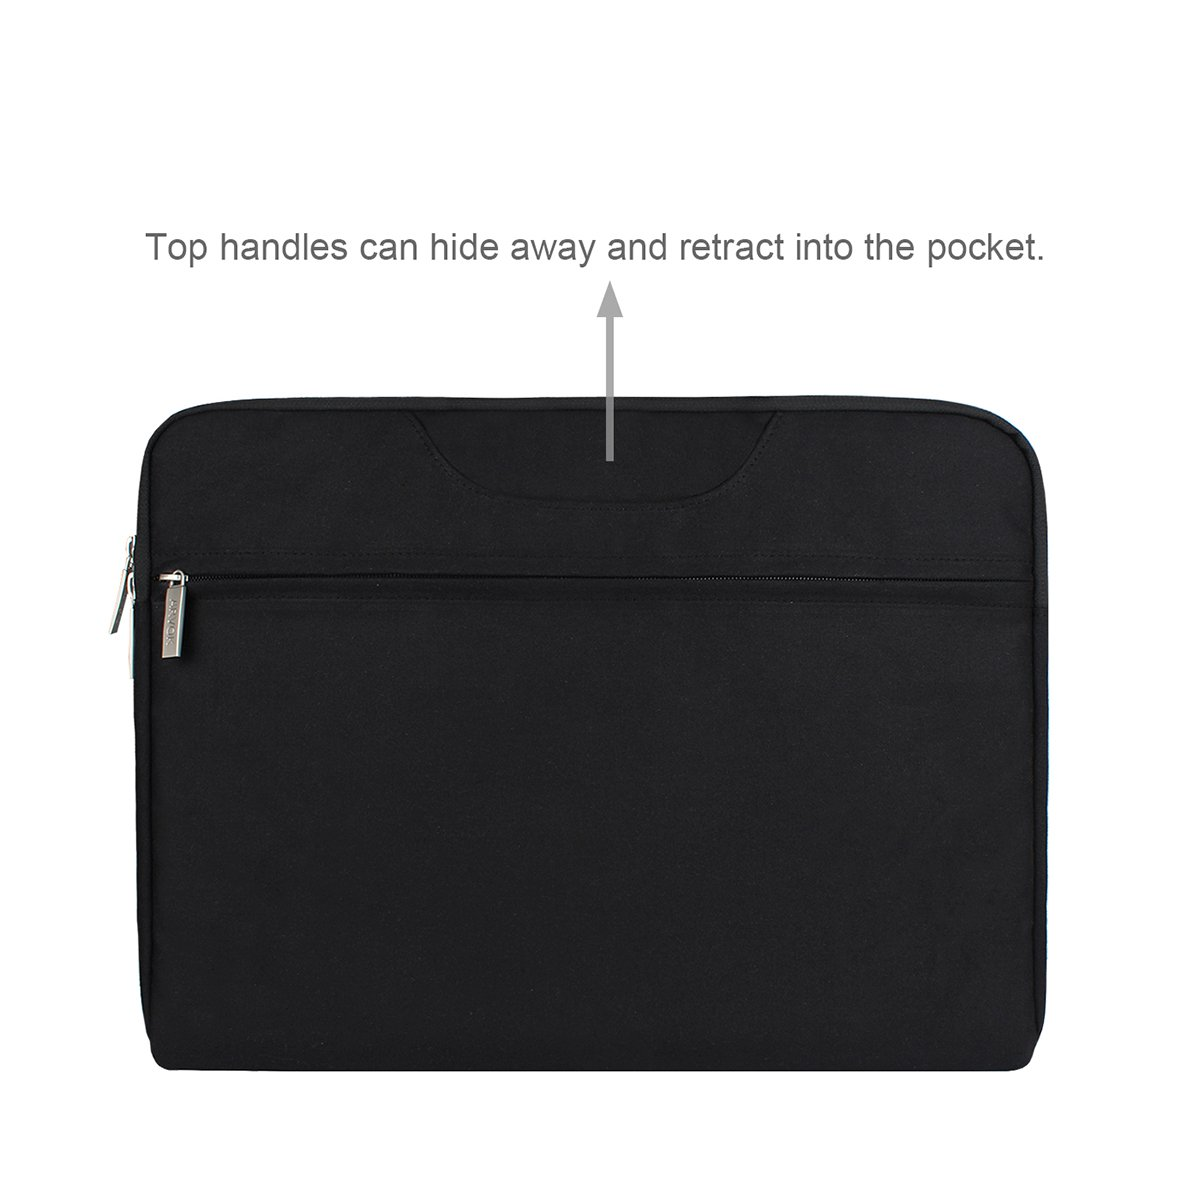 Arvok 15 15.6 Inch Multi-Color & Size Water-resistant Laptop Sleeve Bag with Handle/Notebook Computer Case/Ultrabook Briefcase Carrying Bag, Black by ARVOK (Image #2)